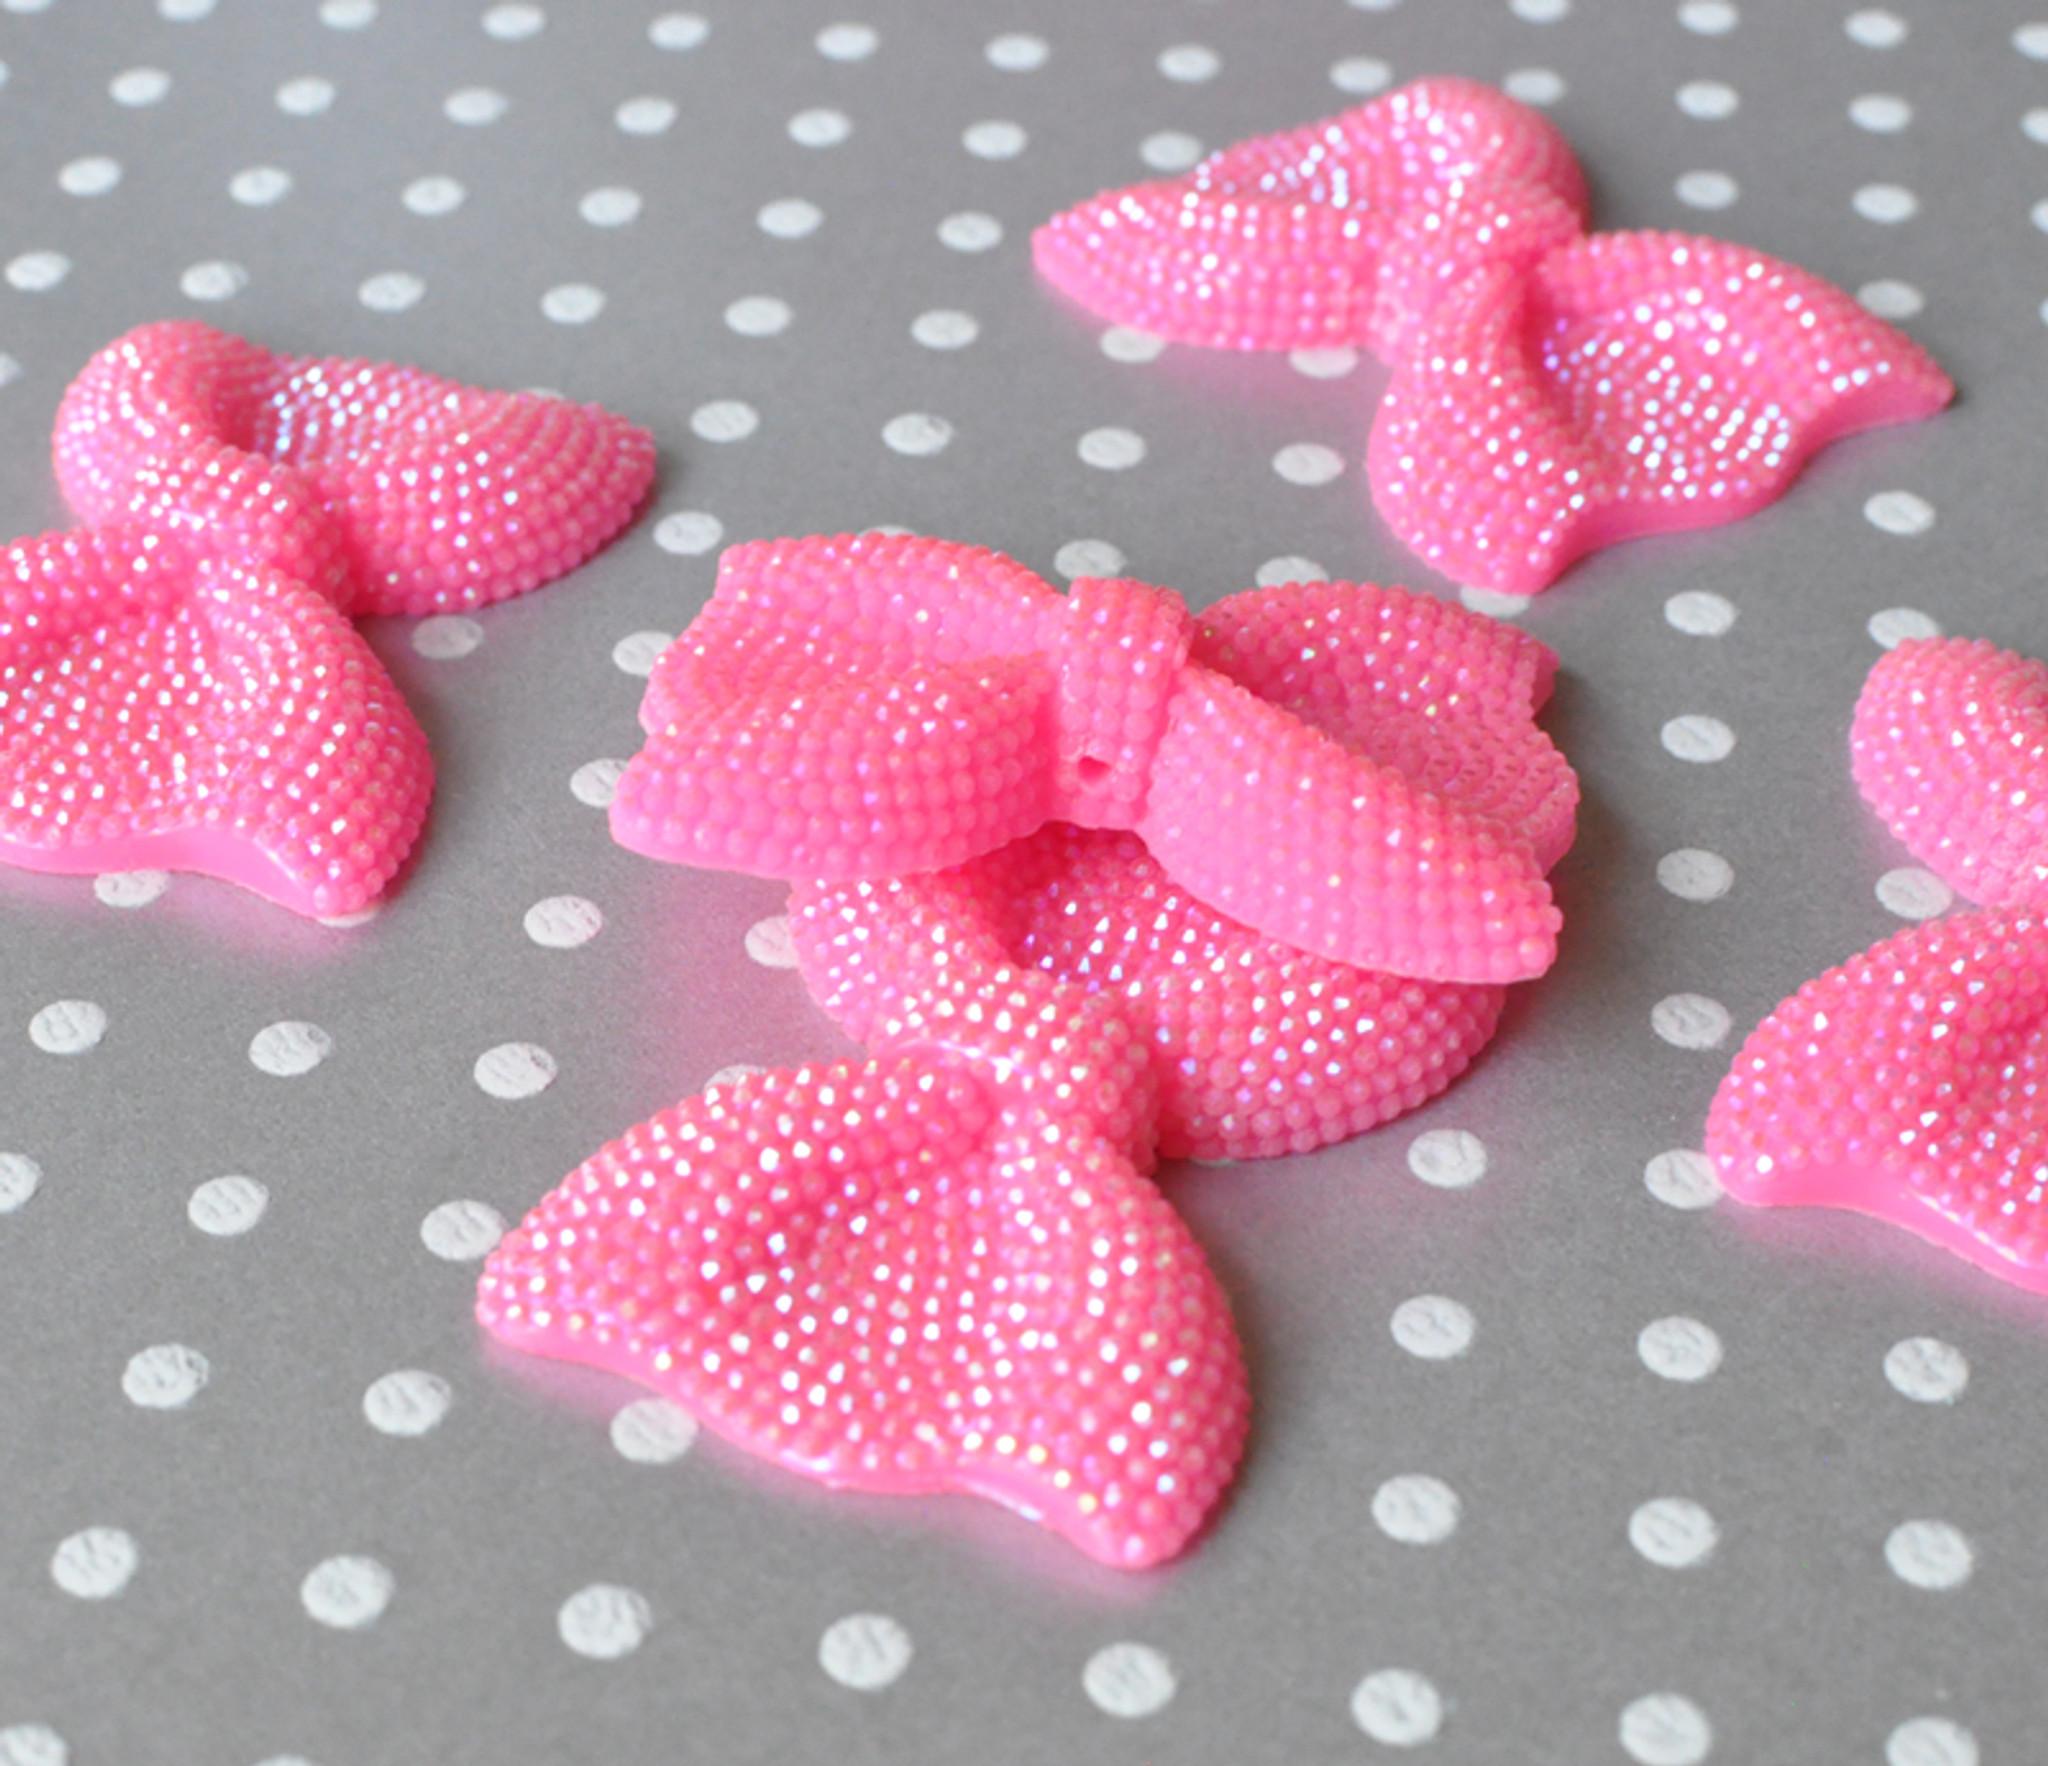 52mm Pink rhinestone large resin bow beads